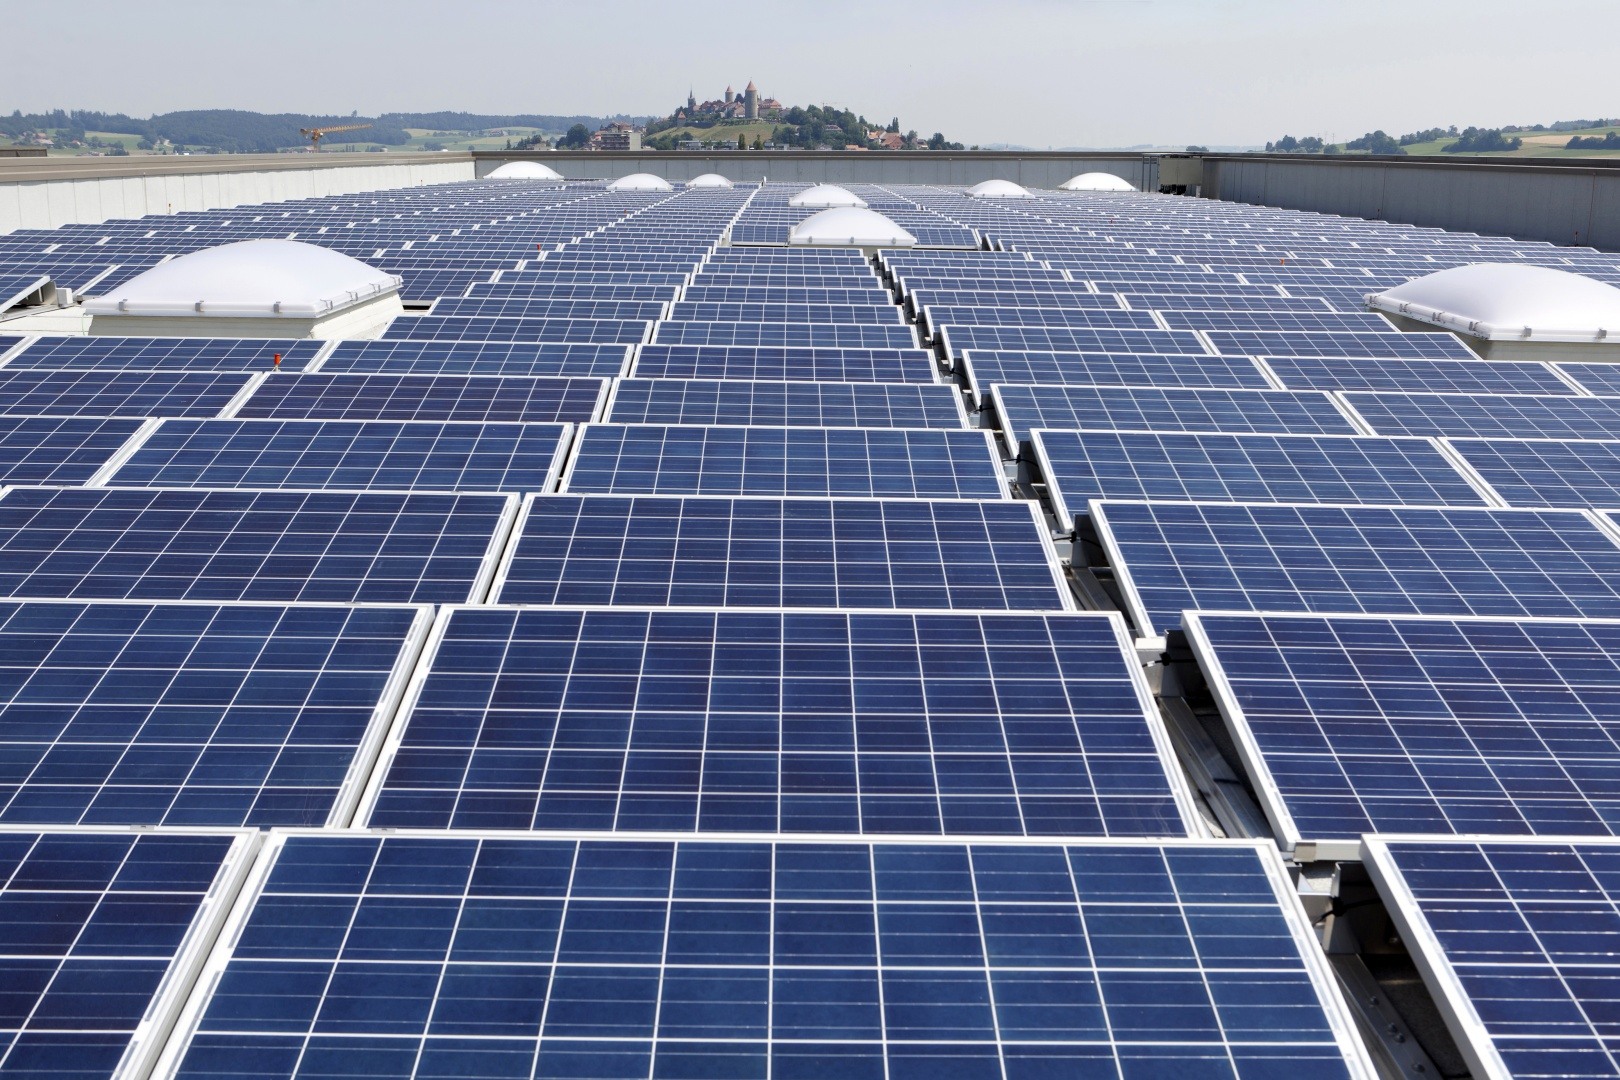 Panneaux photovoltaïque © Nicolas Repond - Nespresso